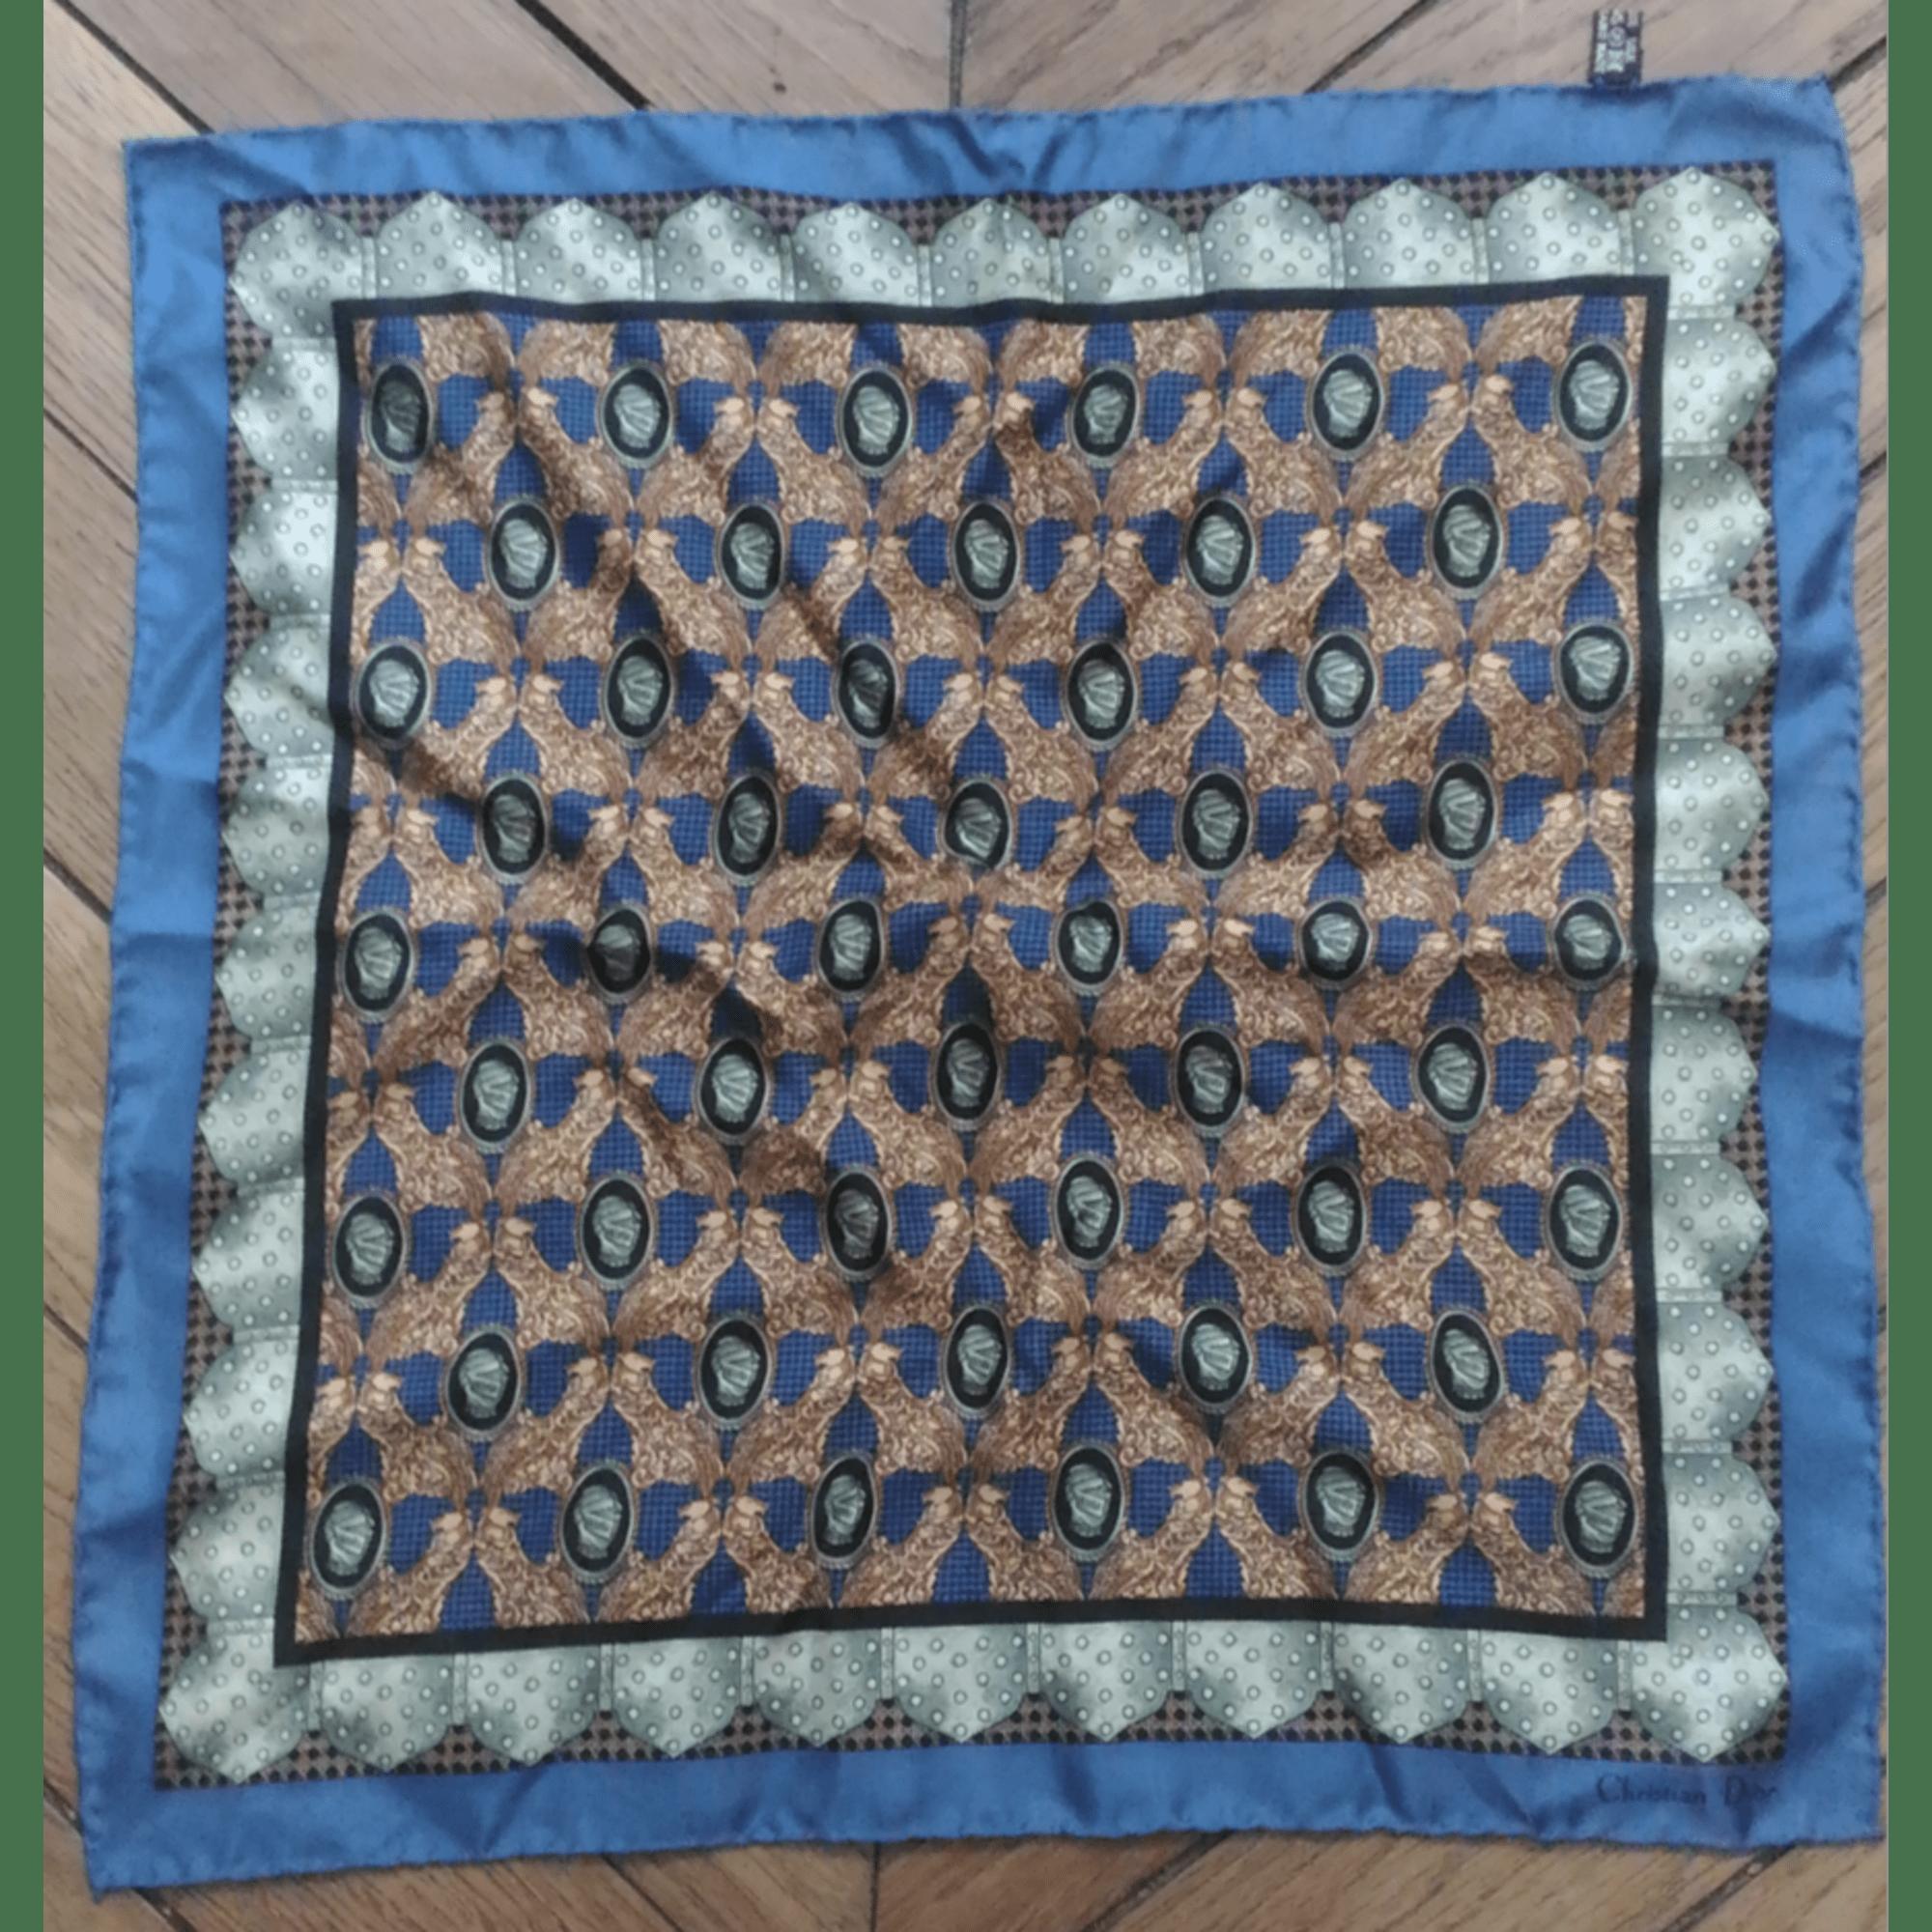 Foulard DIOR Bleu, bleu marine, bleu turquoise